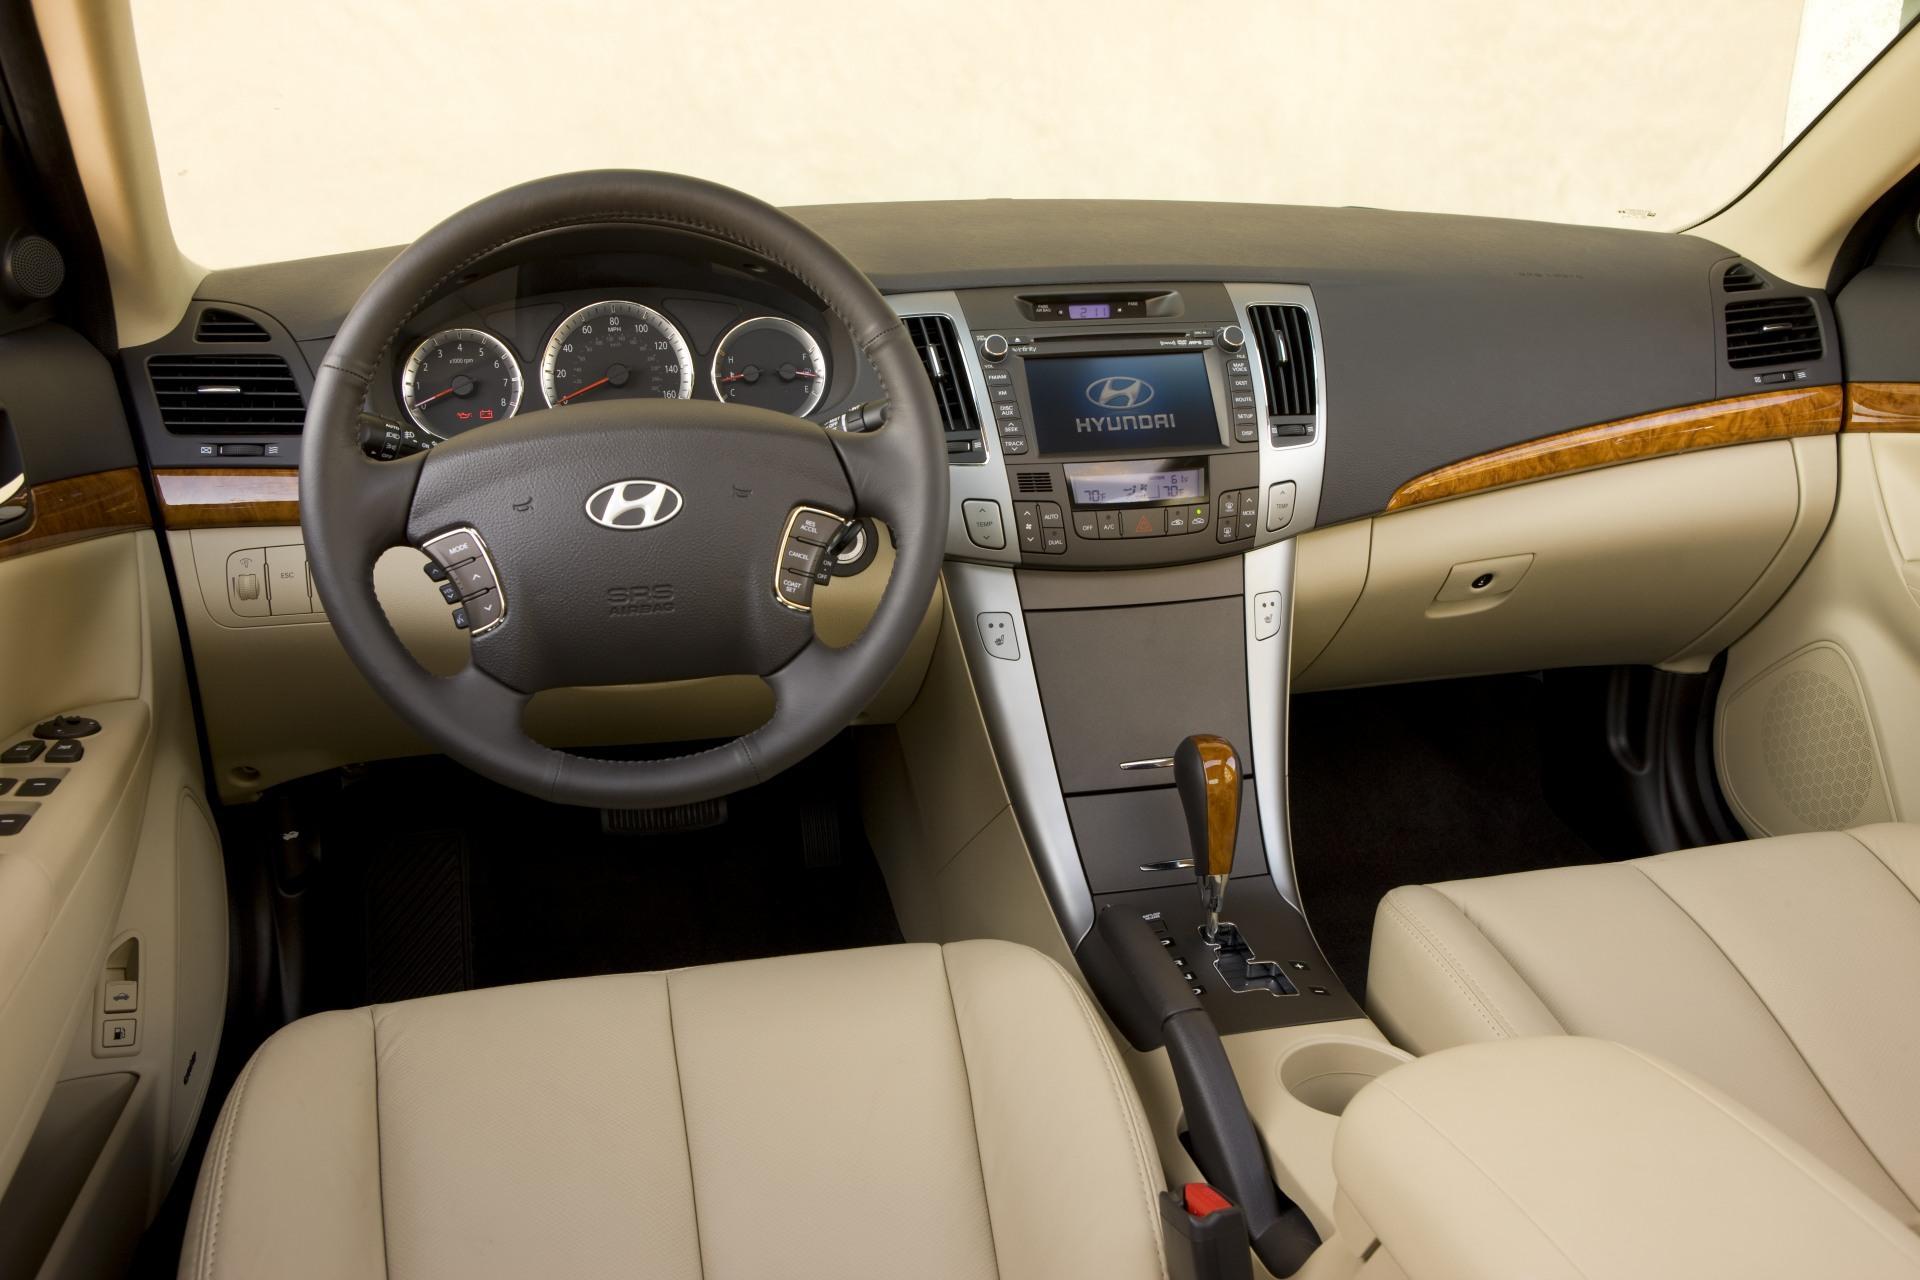 2010 Hyundai Sonata Image Photo 2 Of 17